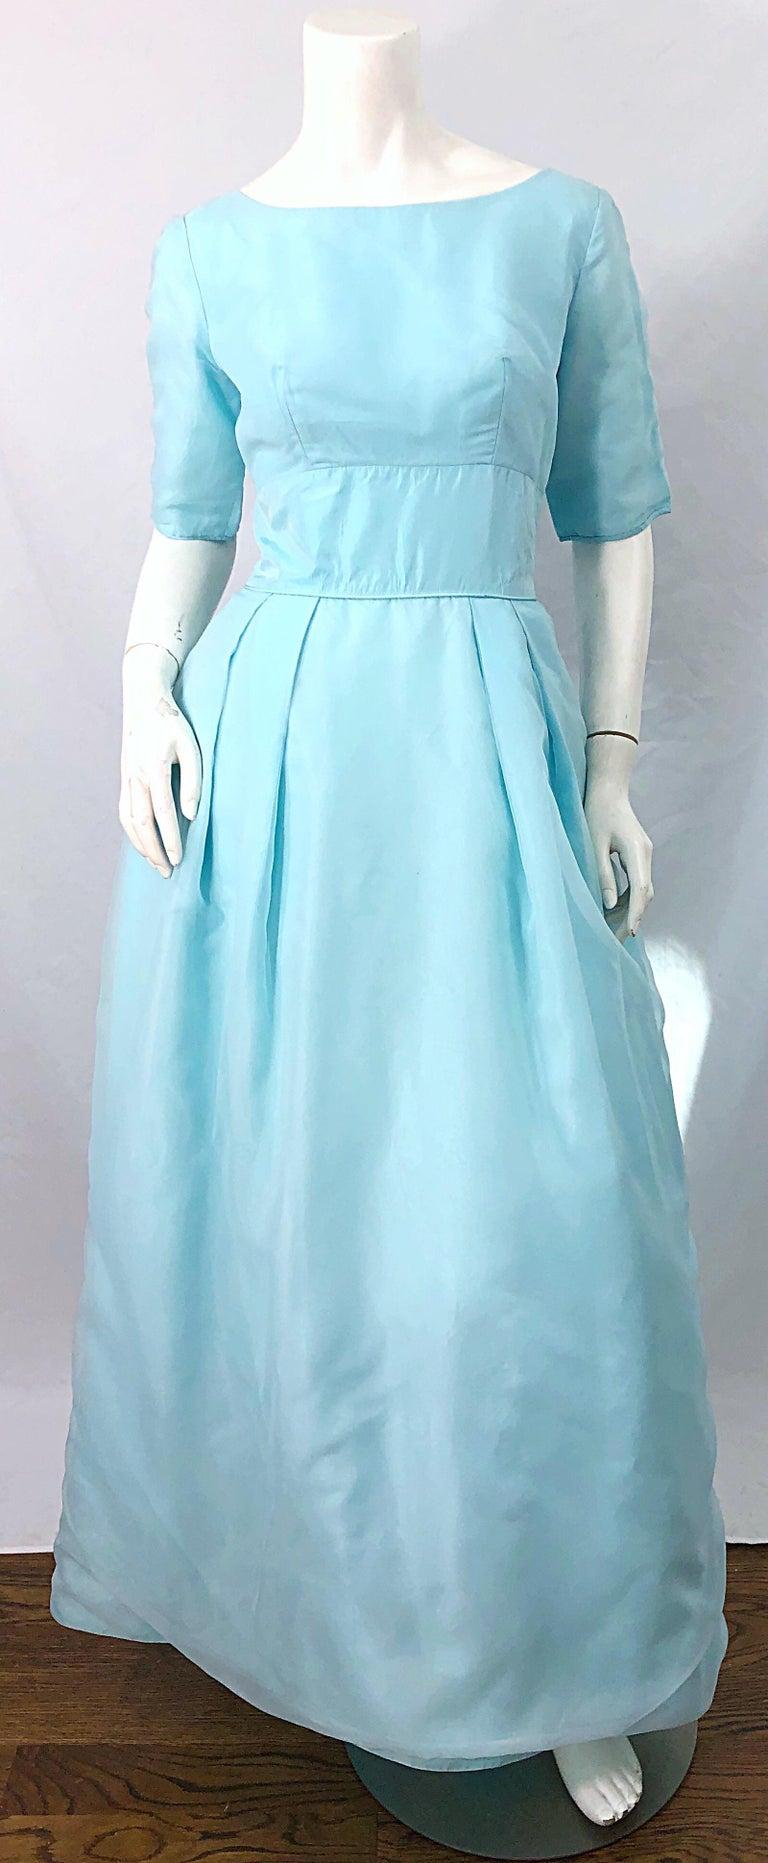 1950s Demi Couture Light Blue Cinderella Silk Chiffon Taffeta 3/4 Sleeves Gown For Sale 7